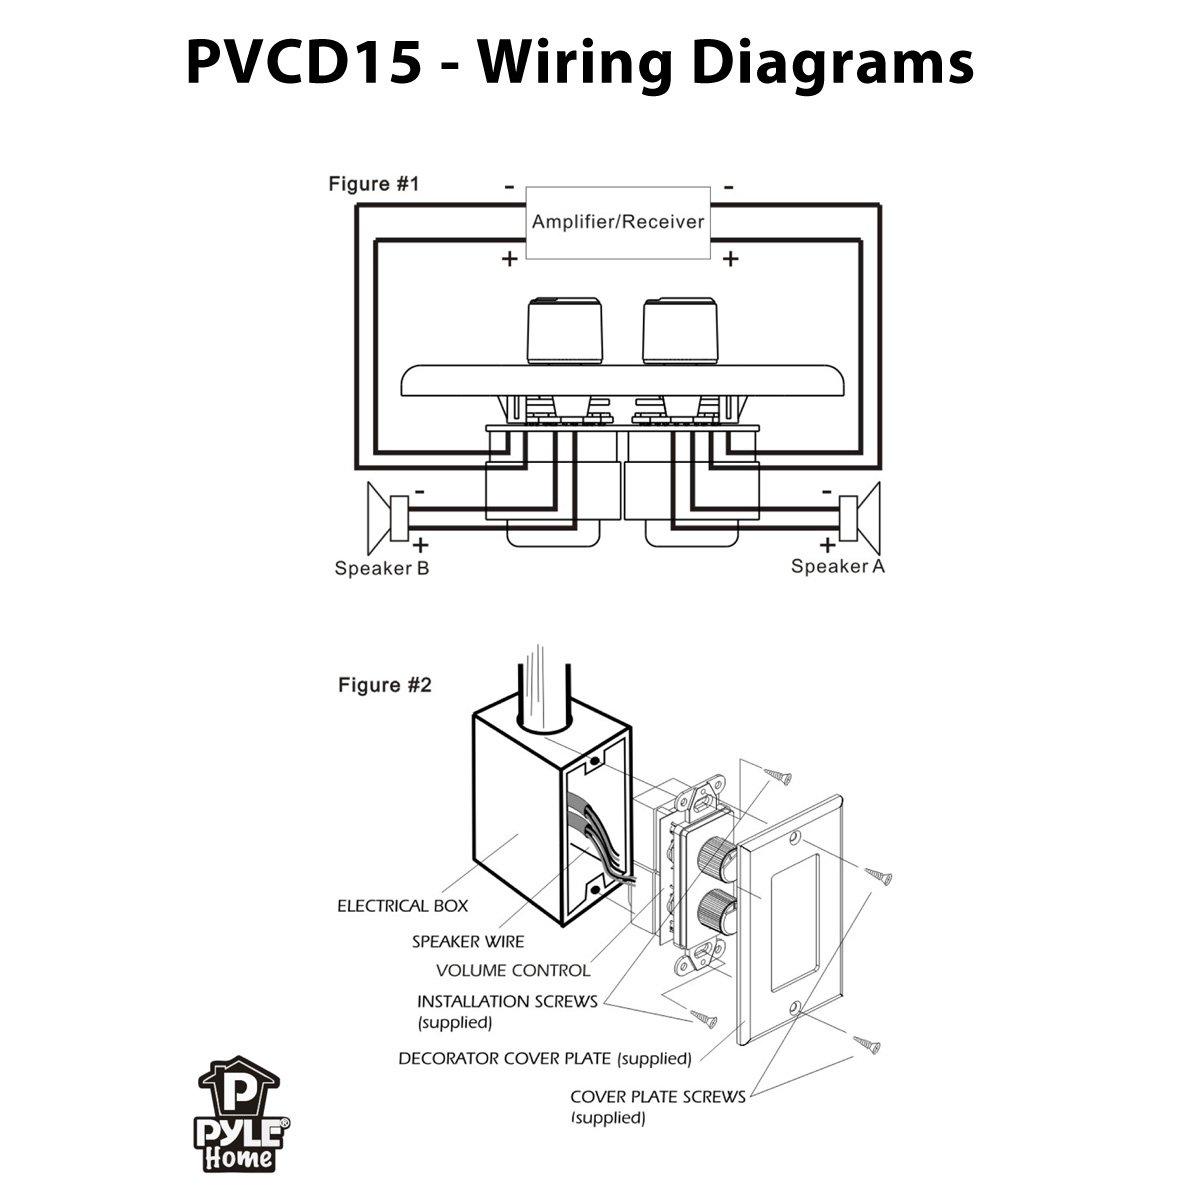 Cn 1881 Speaker Volume Control Wiring Diagram Wiring Diagram